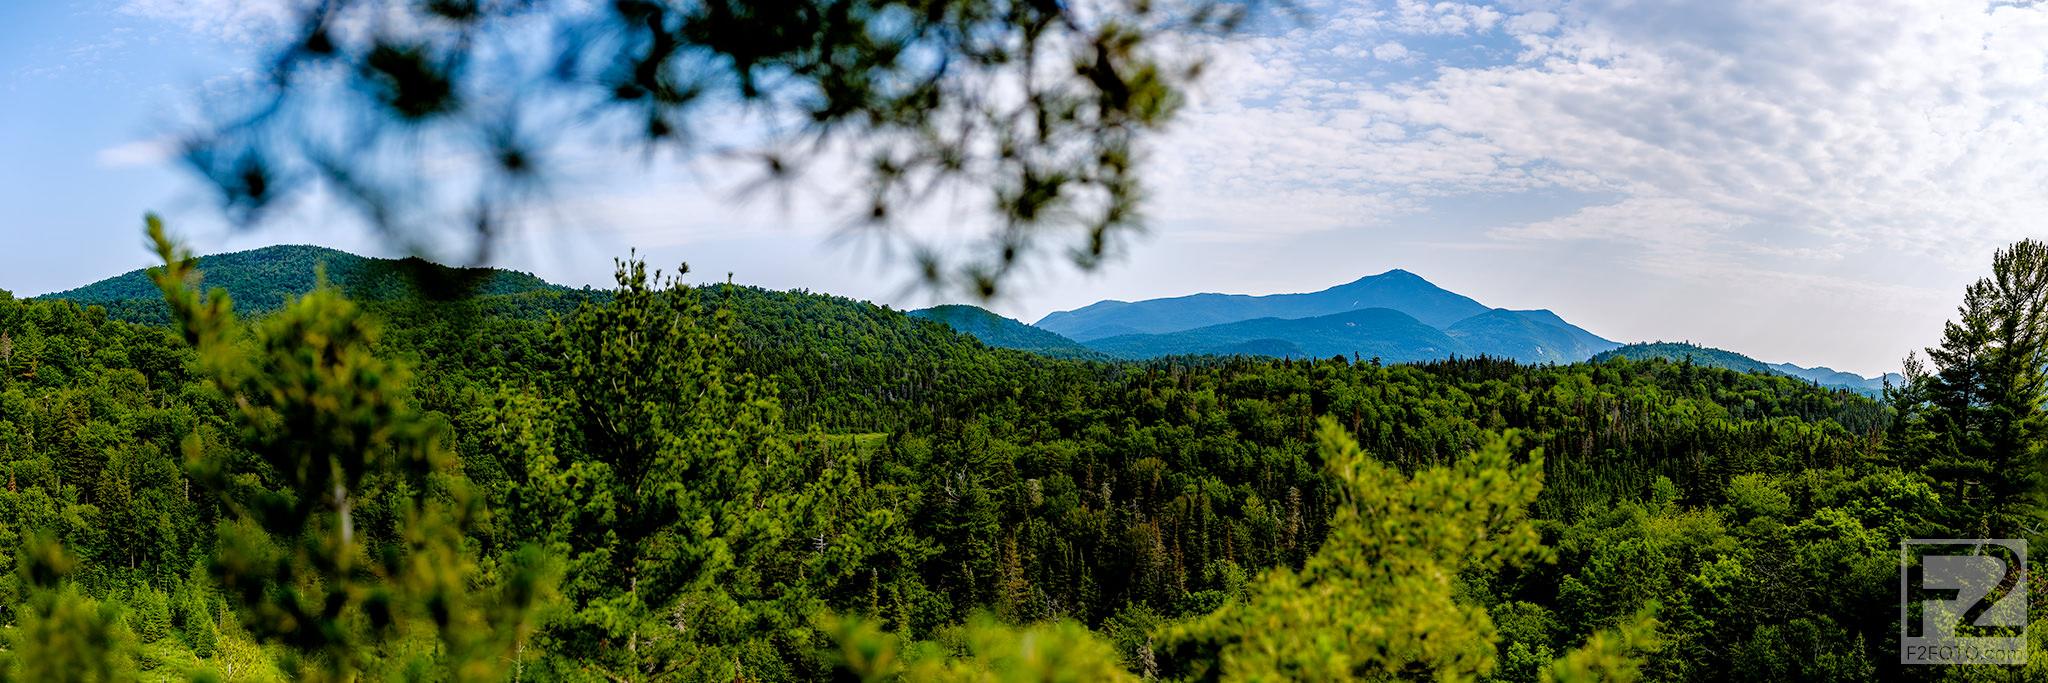 Eastern-White-Pine-Tree-Climb-Panorama_1.jpg